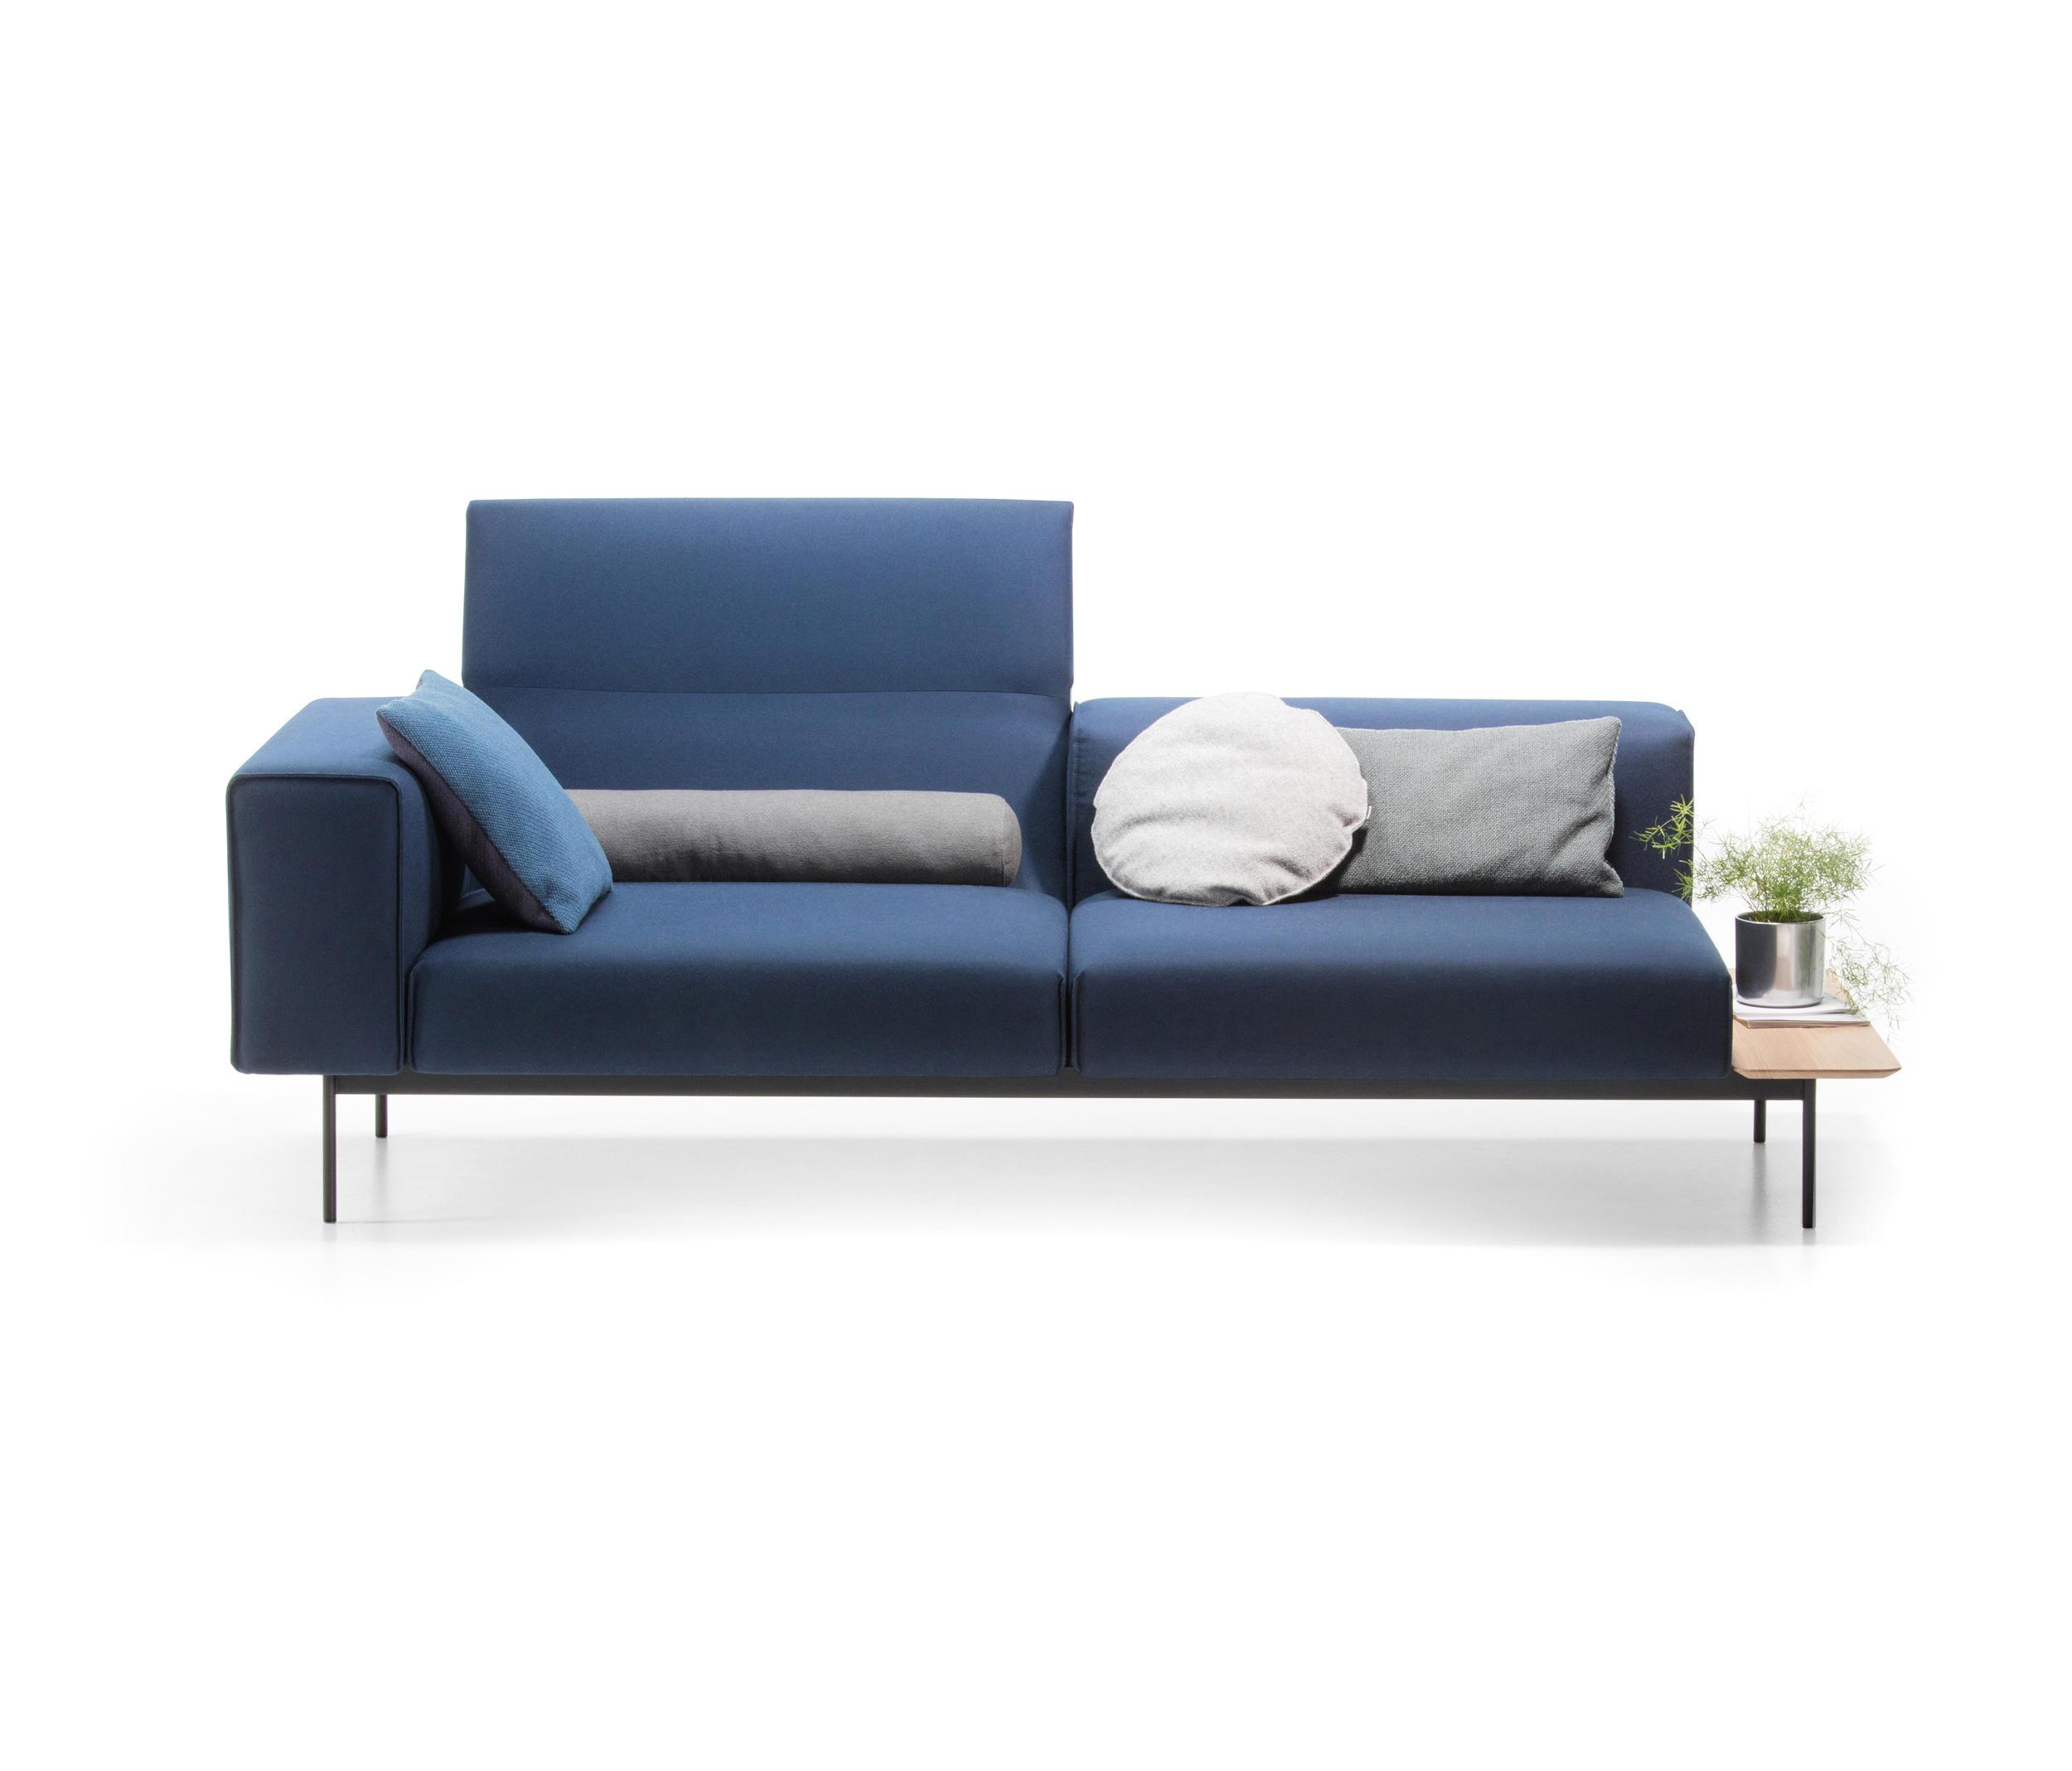 Convert A Sofa Convert A Sofa Home And Textiles Thesofa